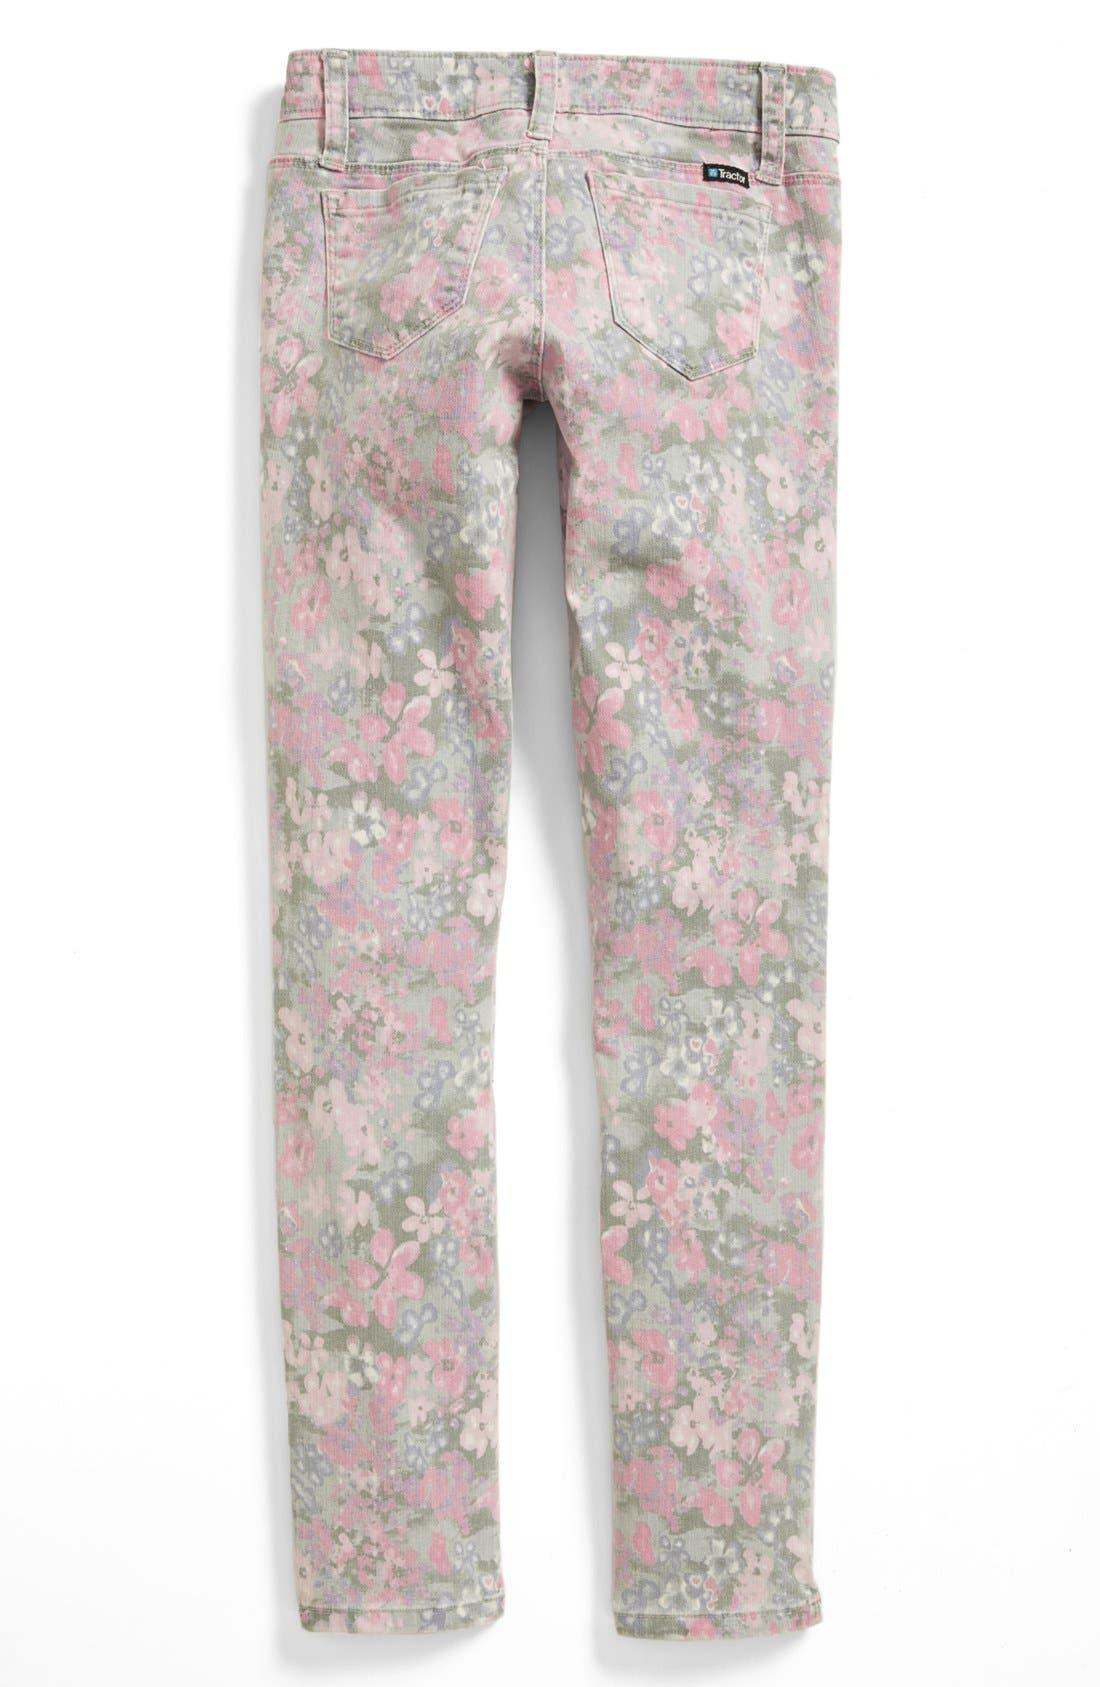 Alternate Image 1 Selected - Tractor Floral Print Denim Pants (Big Girls)